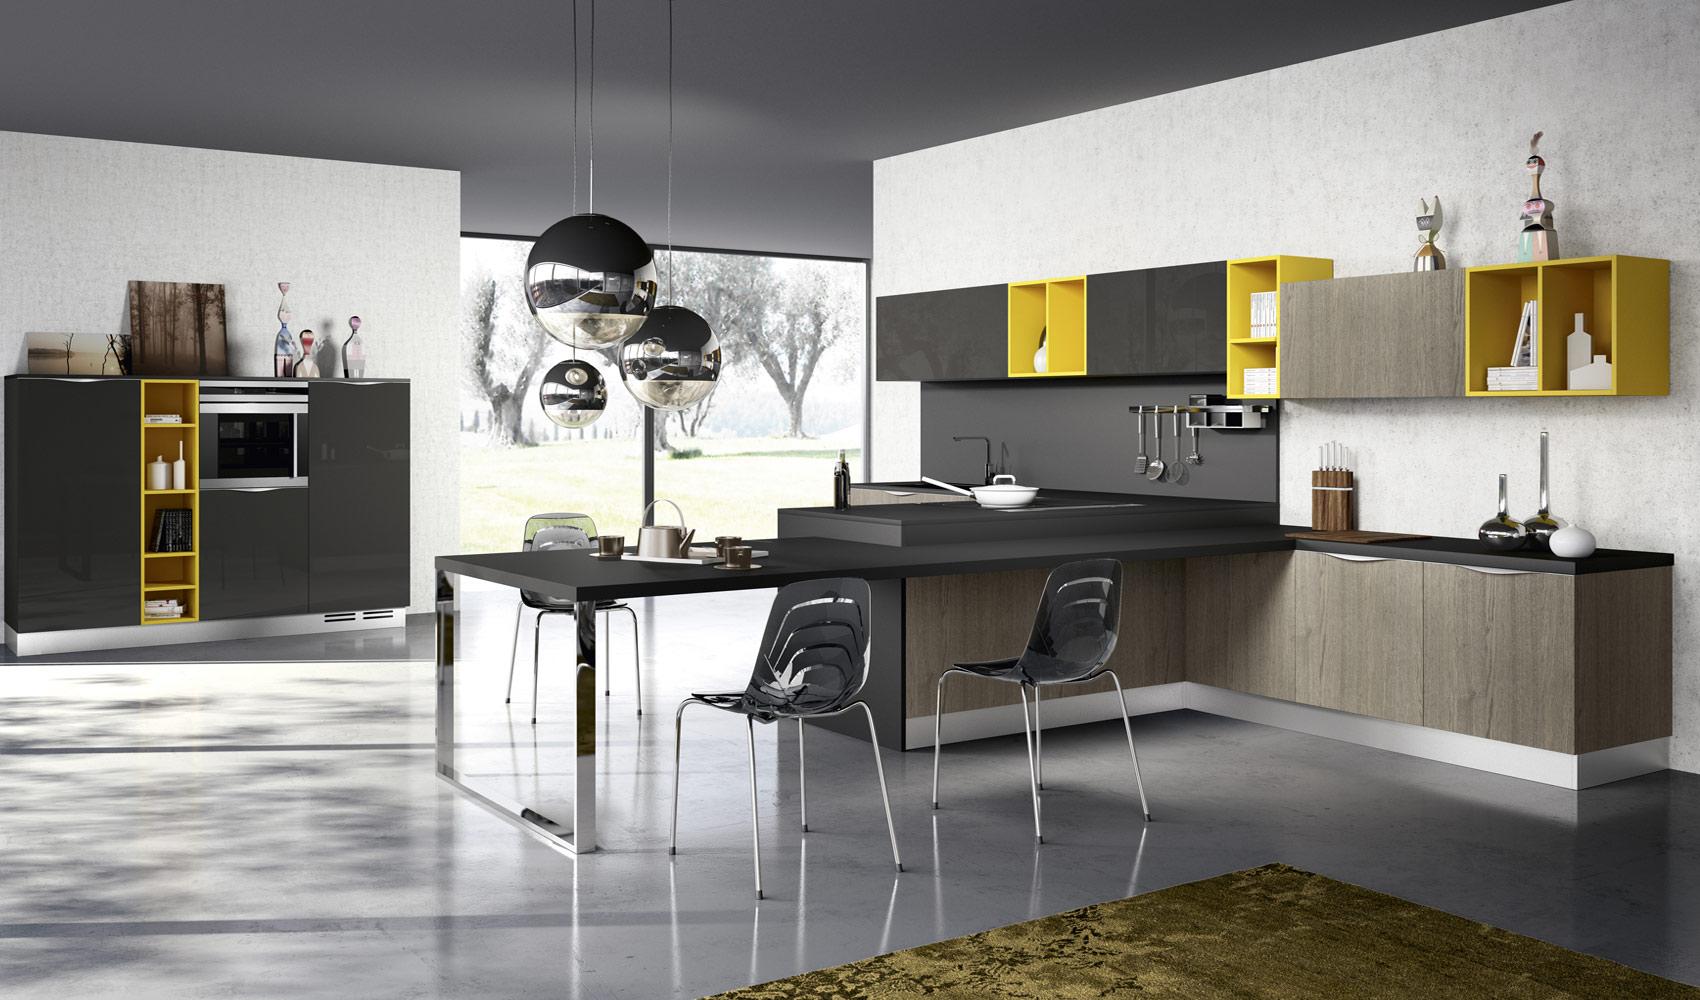 Dise o de cocinas modernas al estilo arte pop construye for Disenos de muebles de cocina colgantes